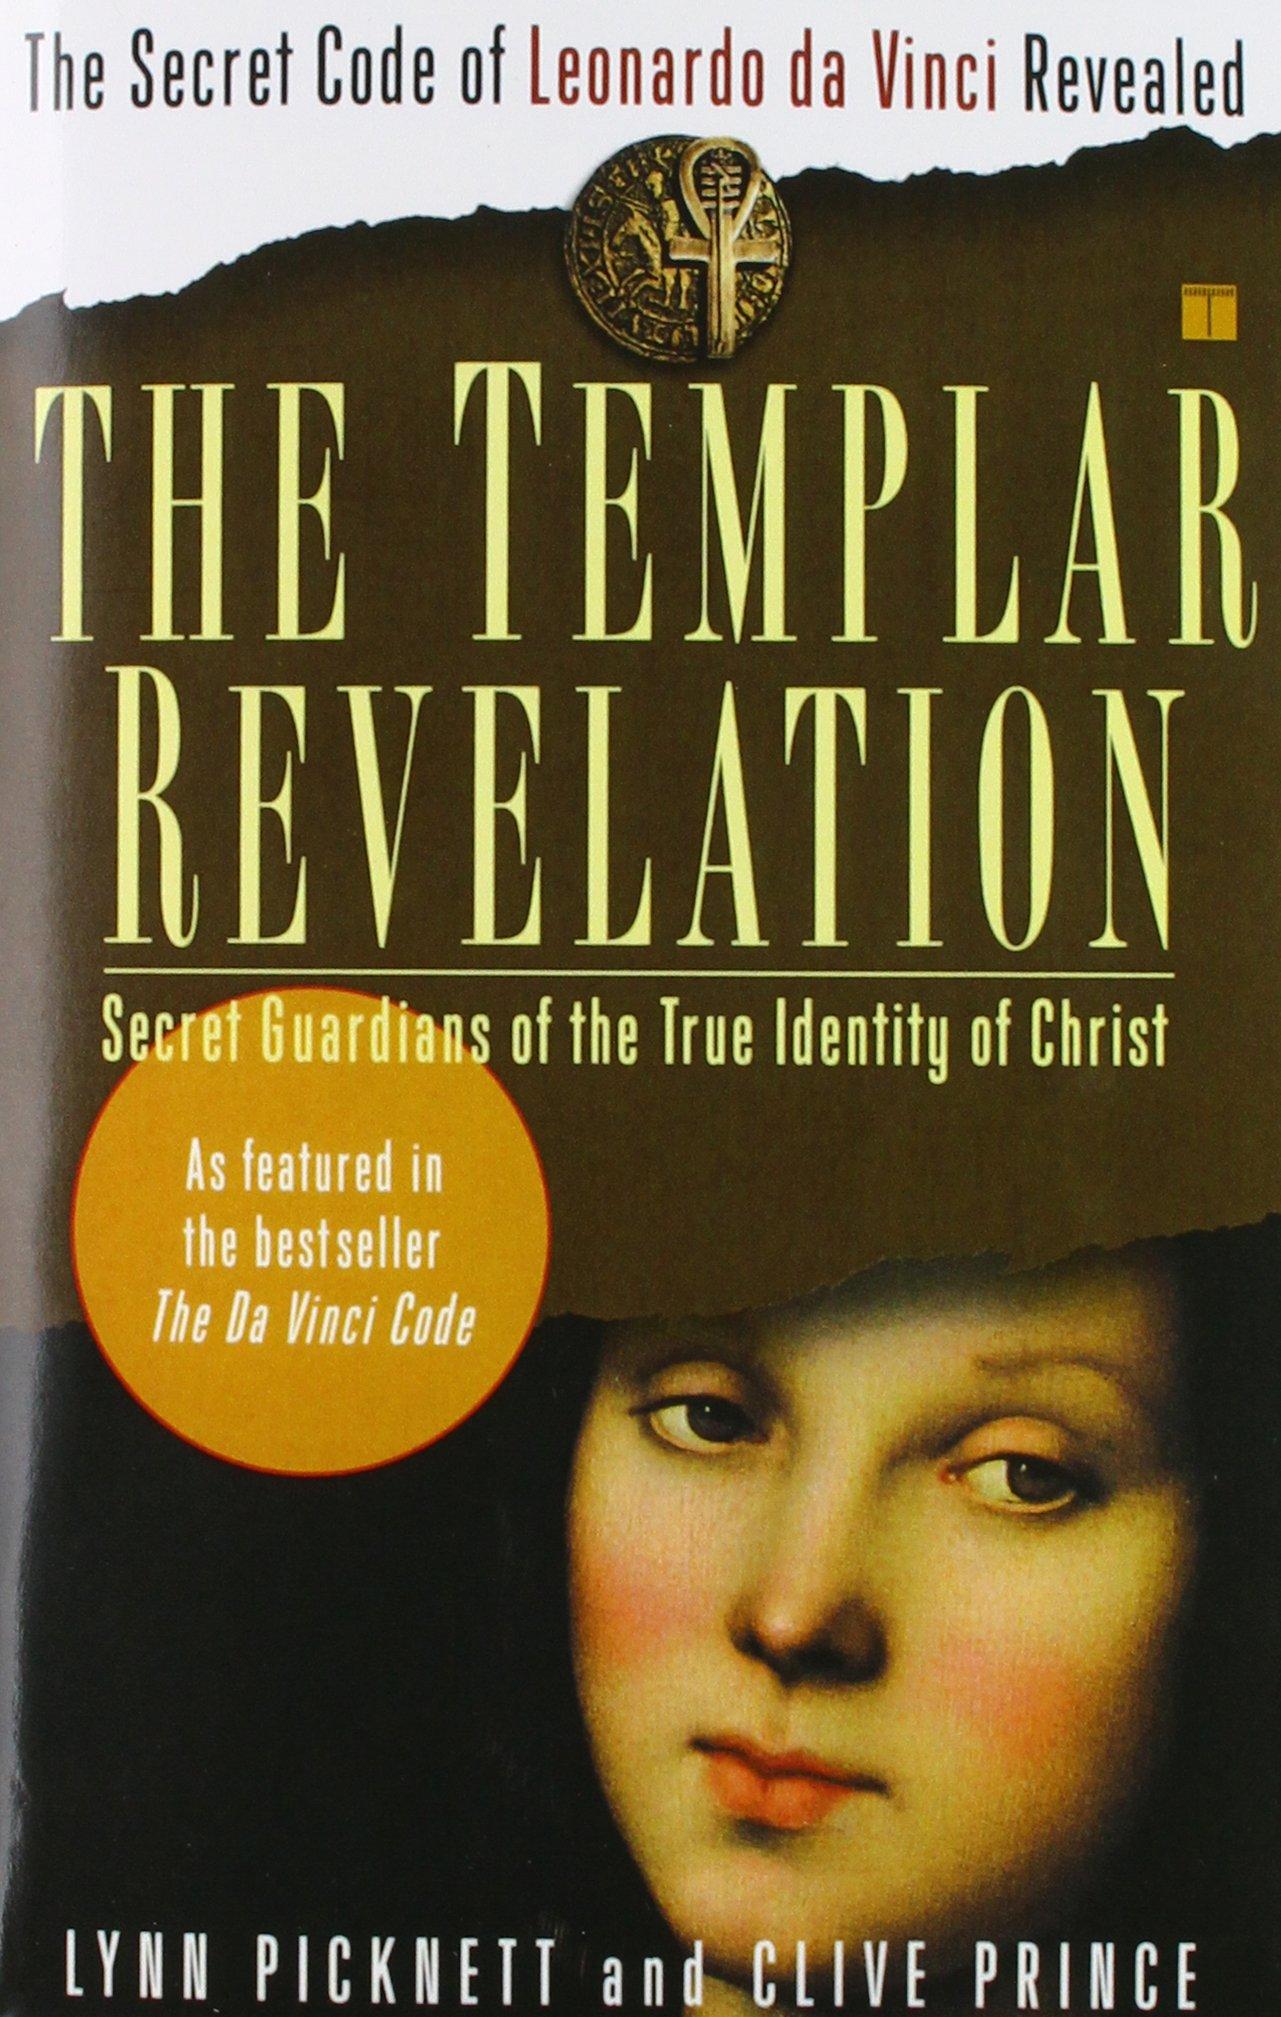 The Templar Revelation: Secret Guardians of the True Identity of Christ:  Lynn Picknett, Clive Prince: 9780684848914: Amazon.com: Books